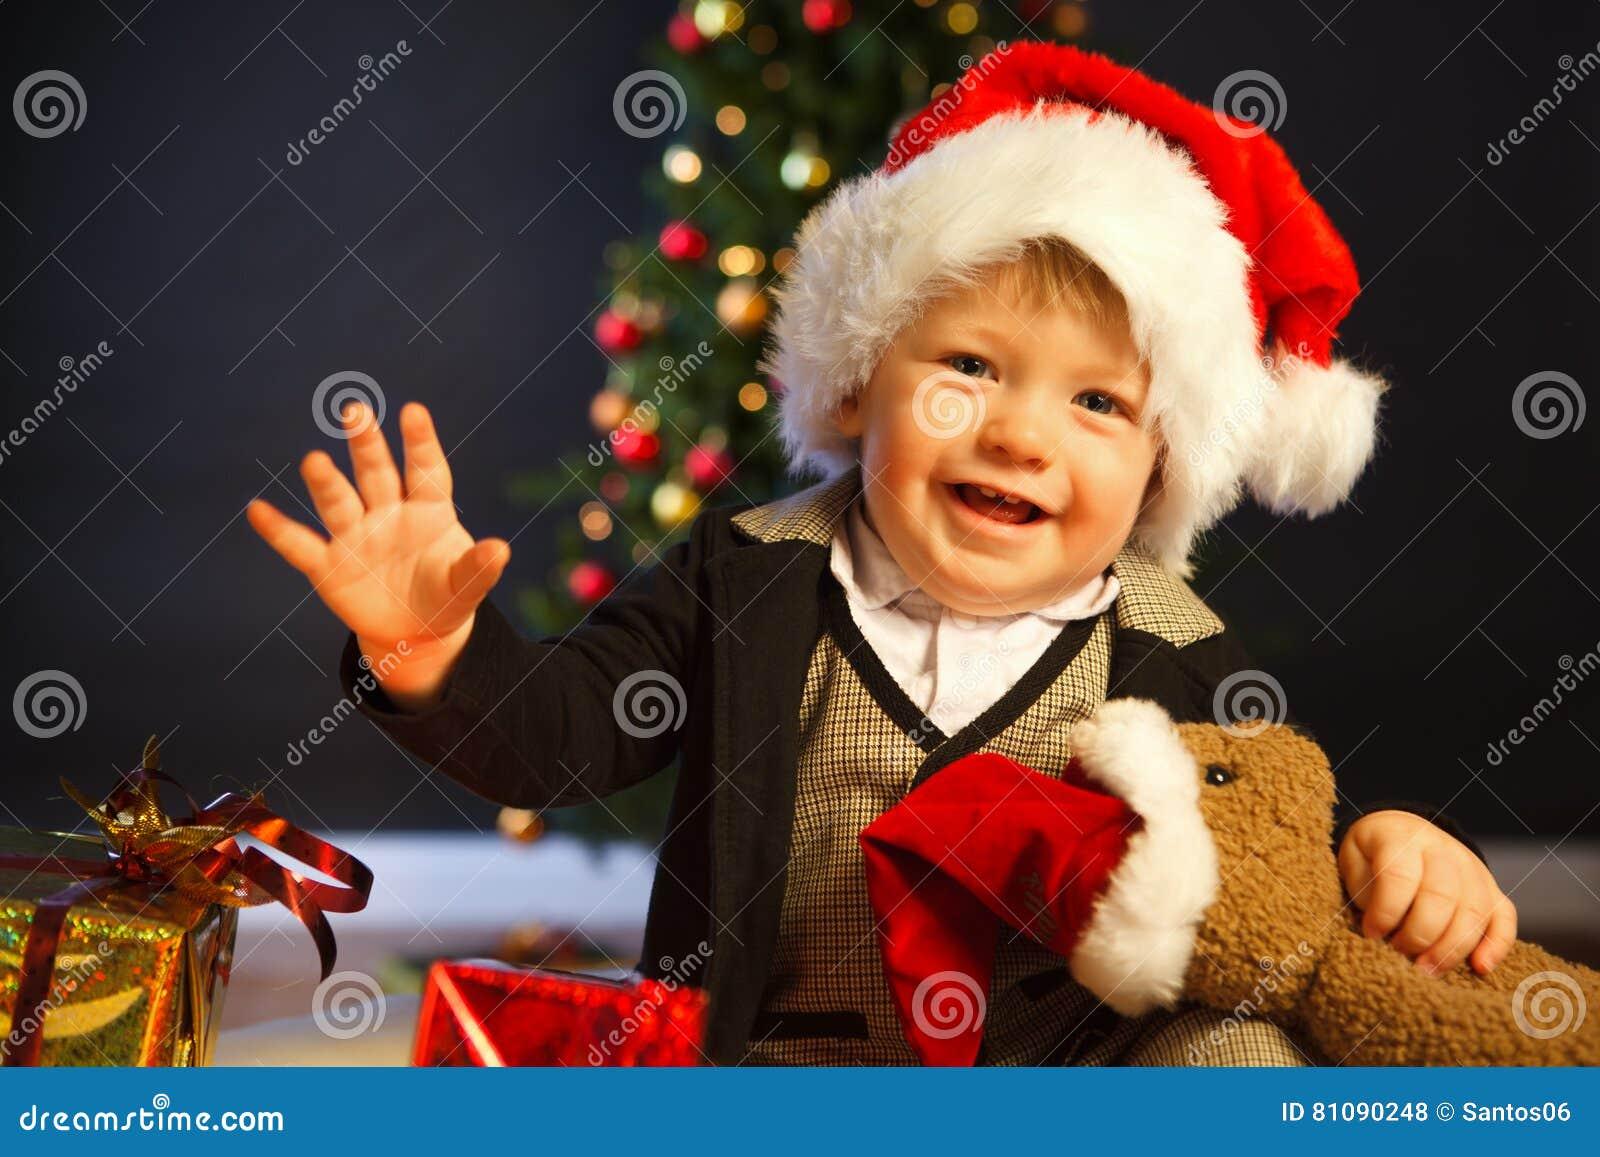 88d72575d37 Santa baby stock photo. Image of infant